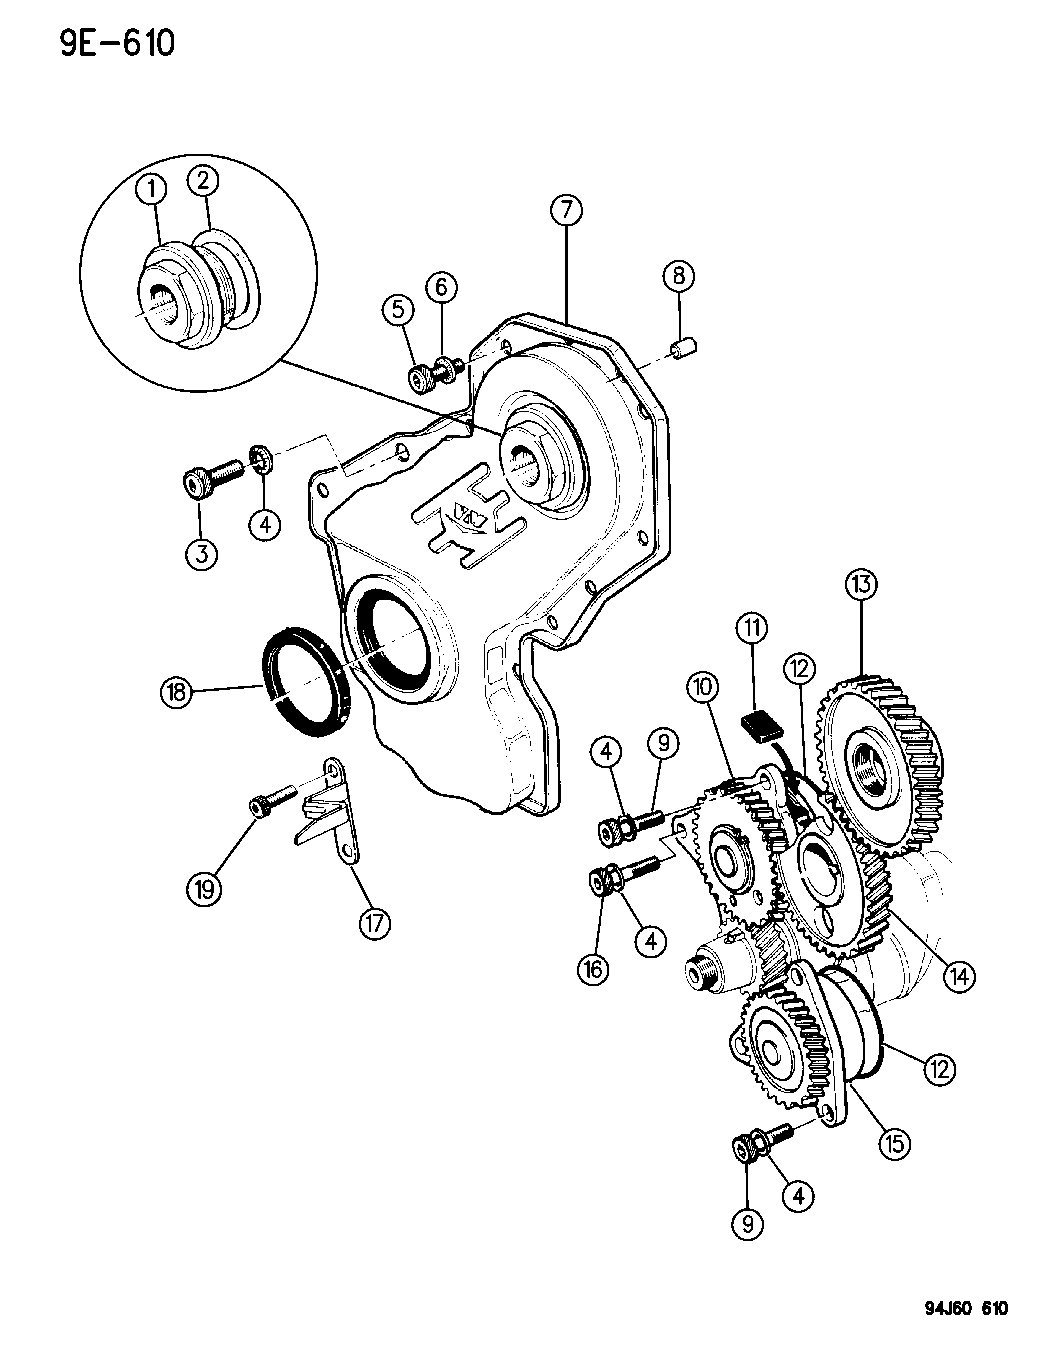 1995 Jeep Cherokee Timing Gears & Case